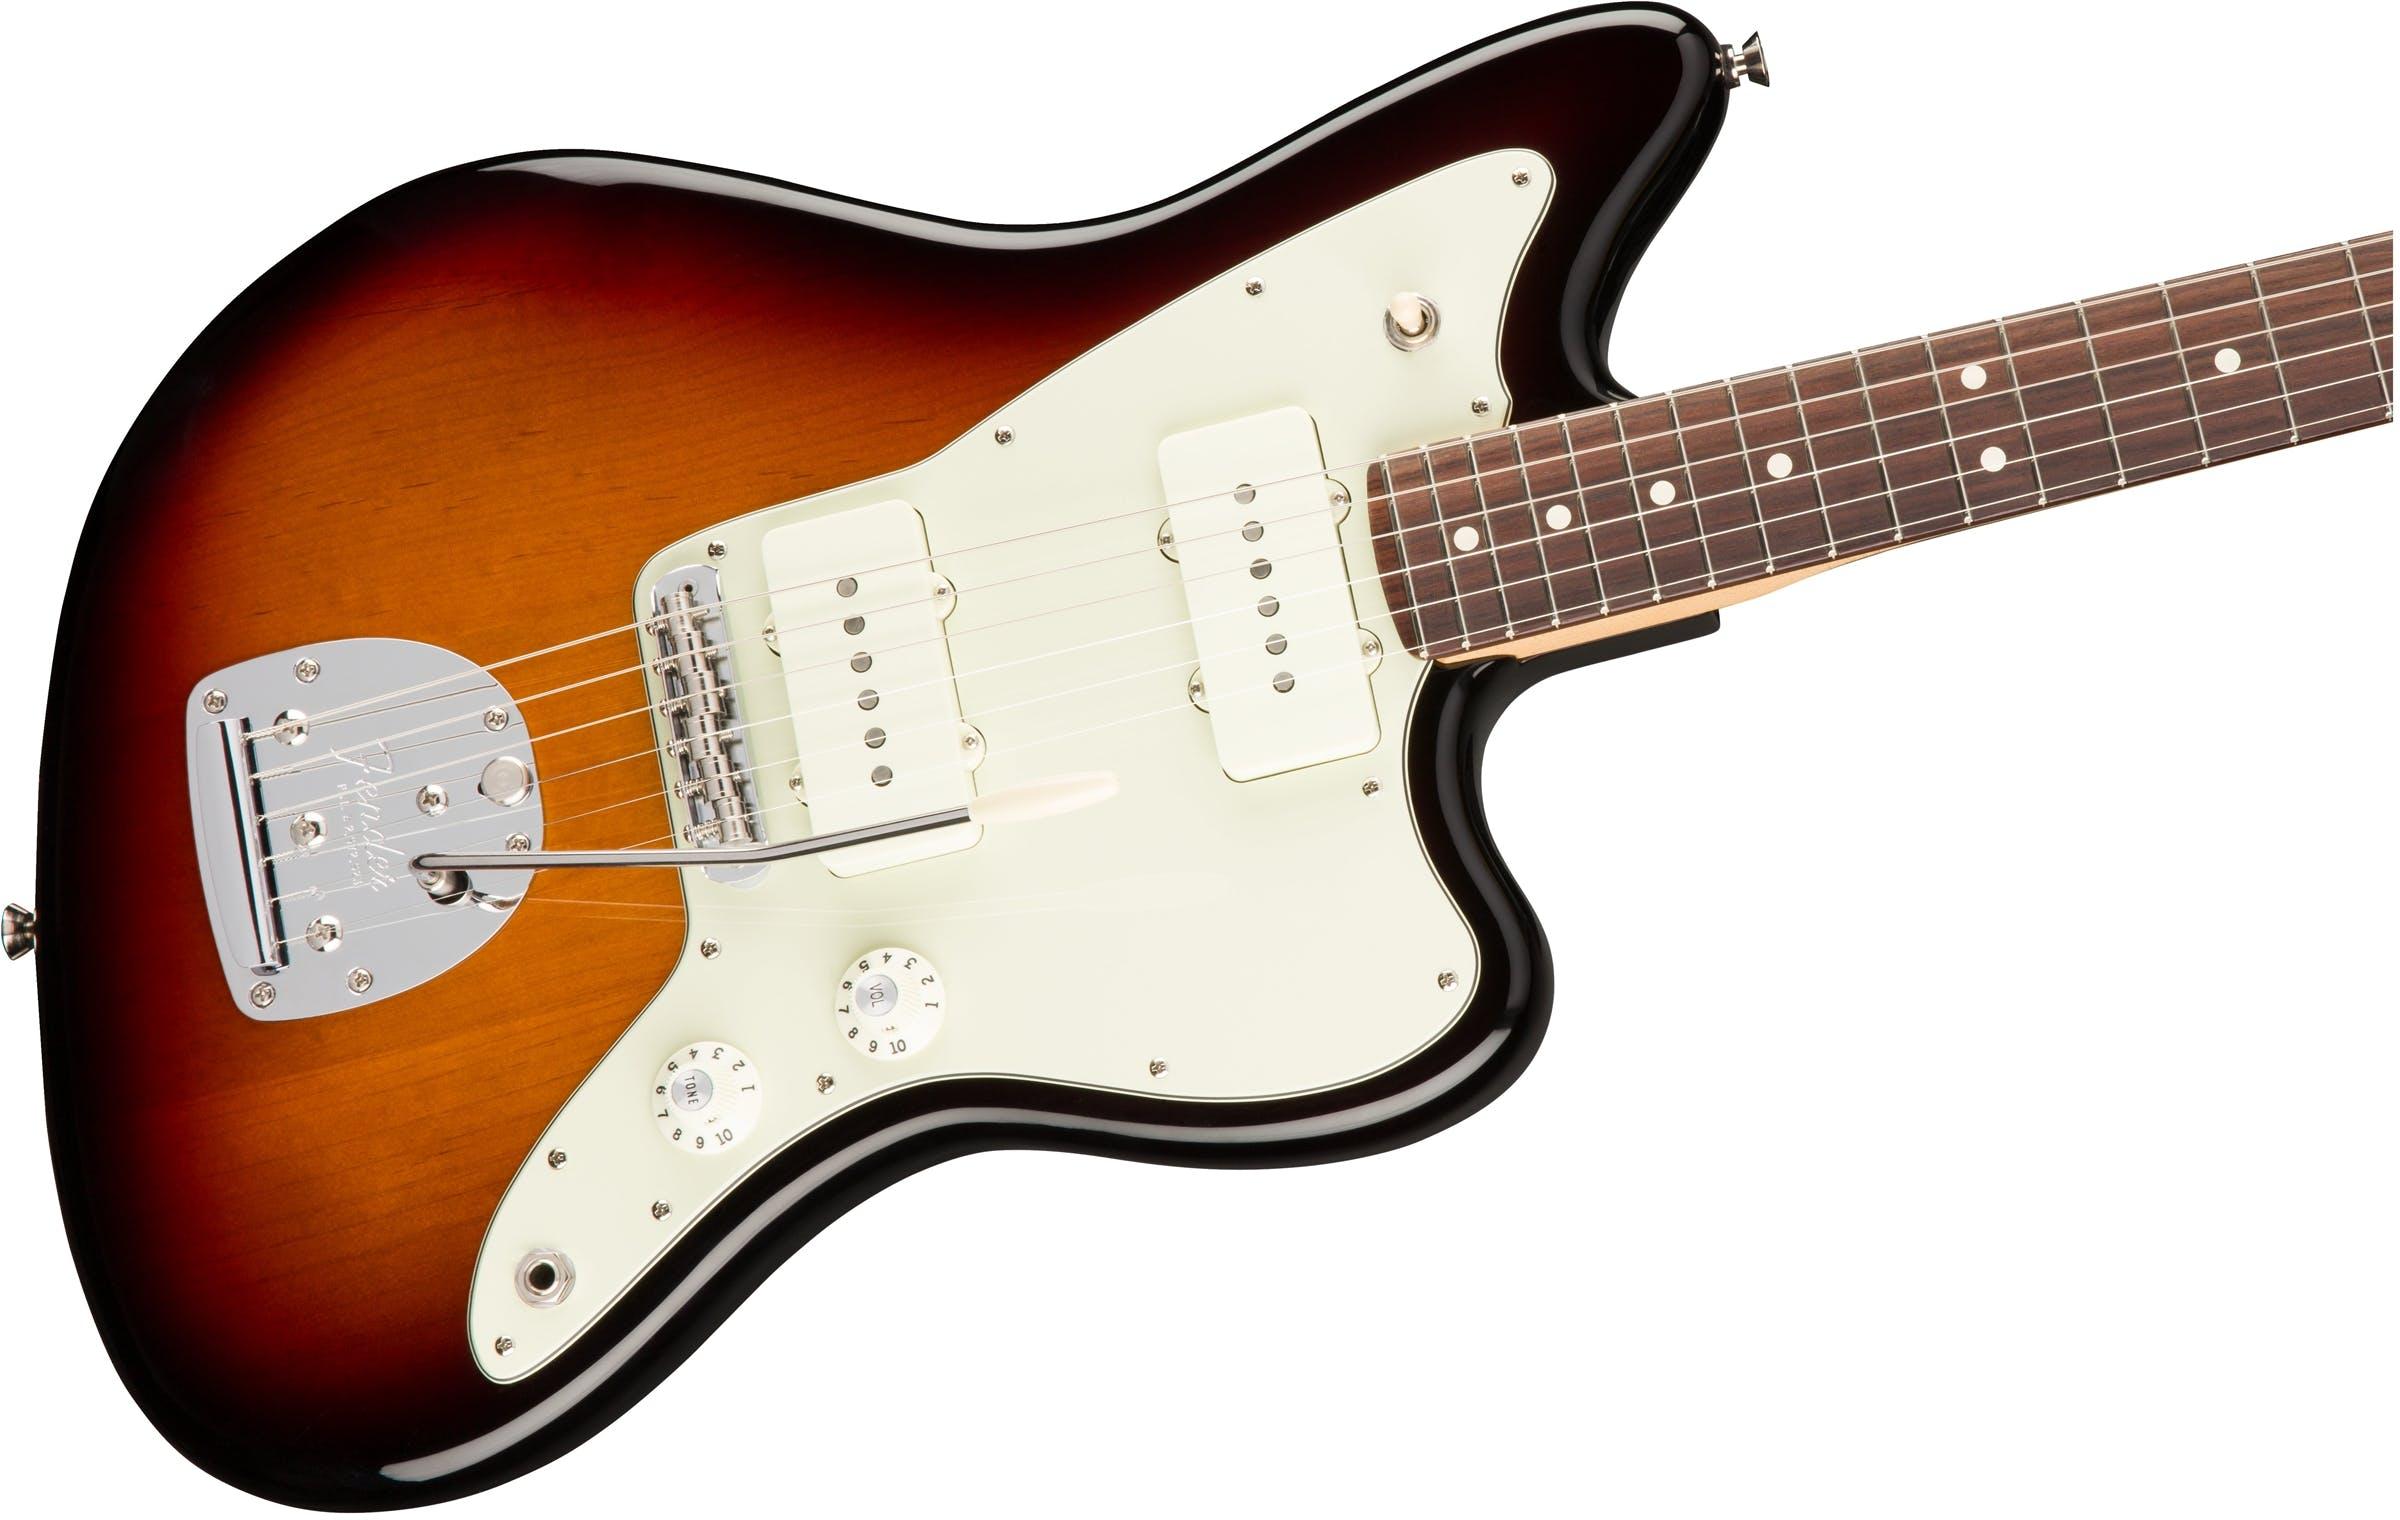 Fender American Professional Jazzmaster Wiring Diagram Wire Center Series Rw 3 Tone Sunburst Rh Andertons Co Uk Jaguar Hh Strat Plus